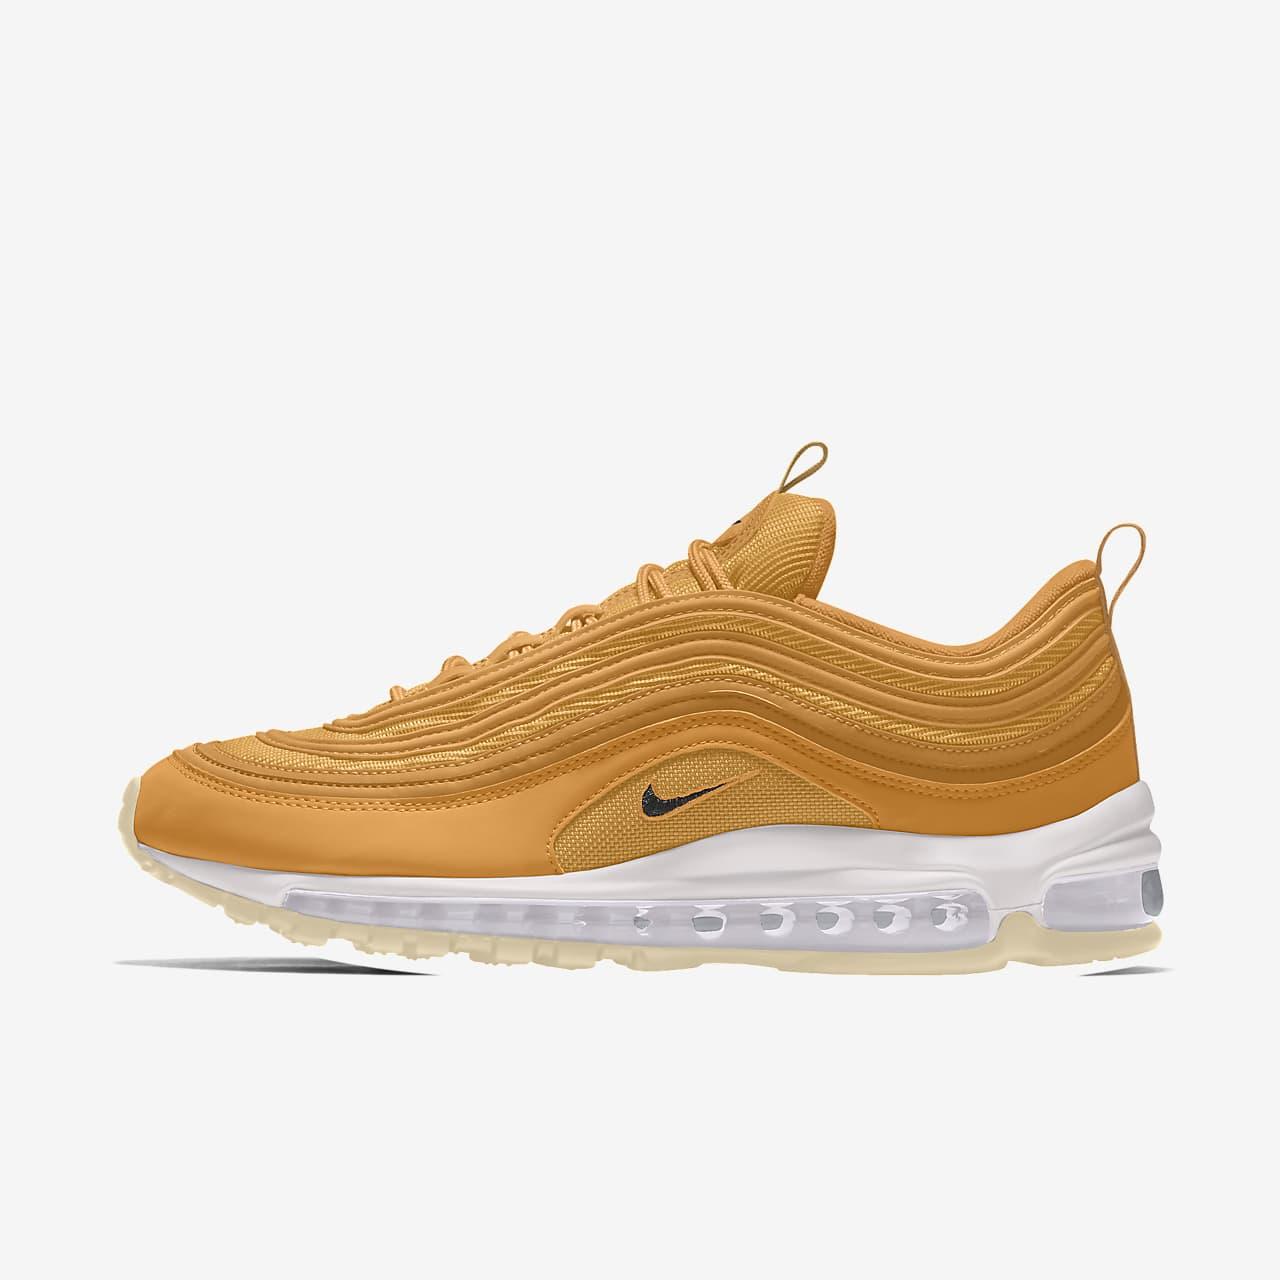 Specialdesignad sko Nike Air Max 97 By You för kvinnor